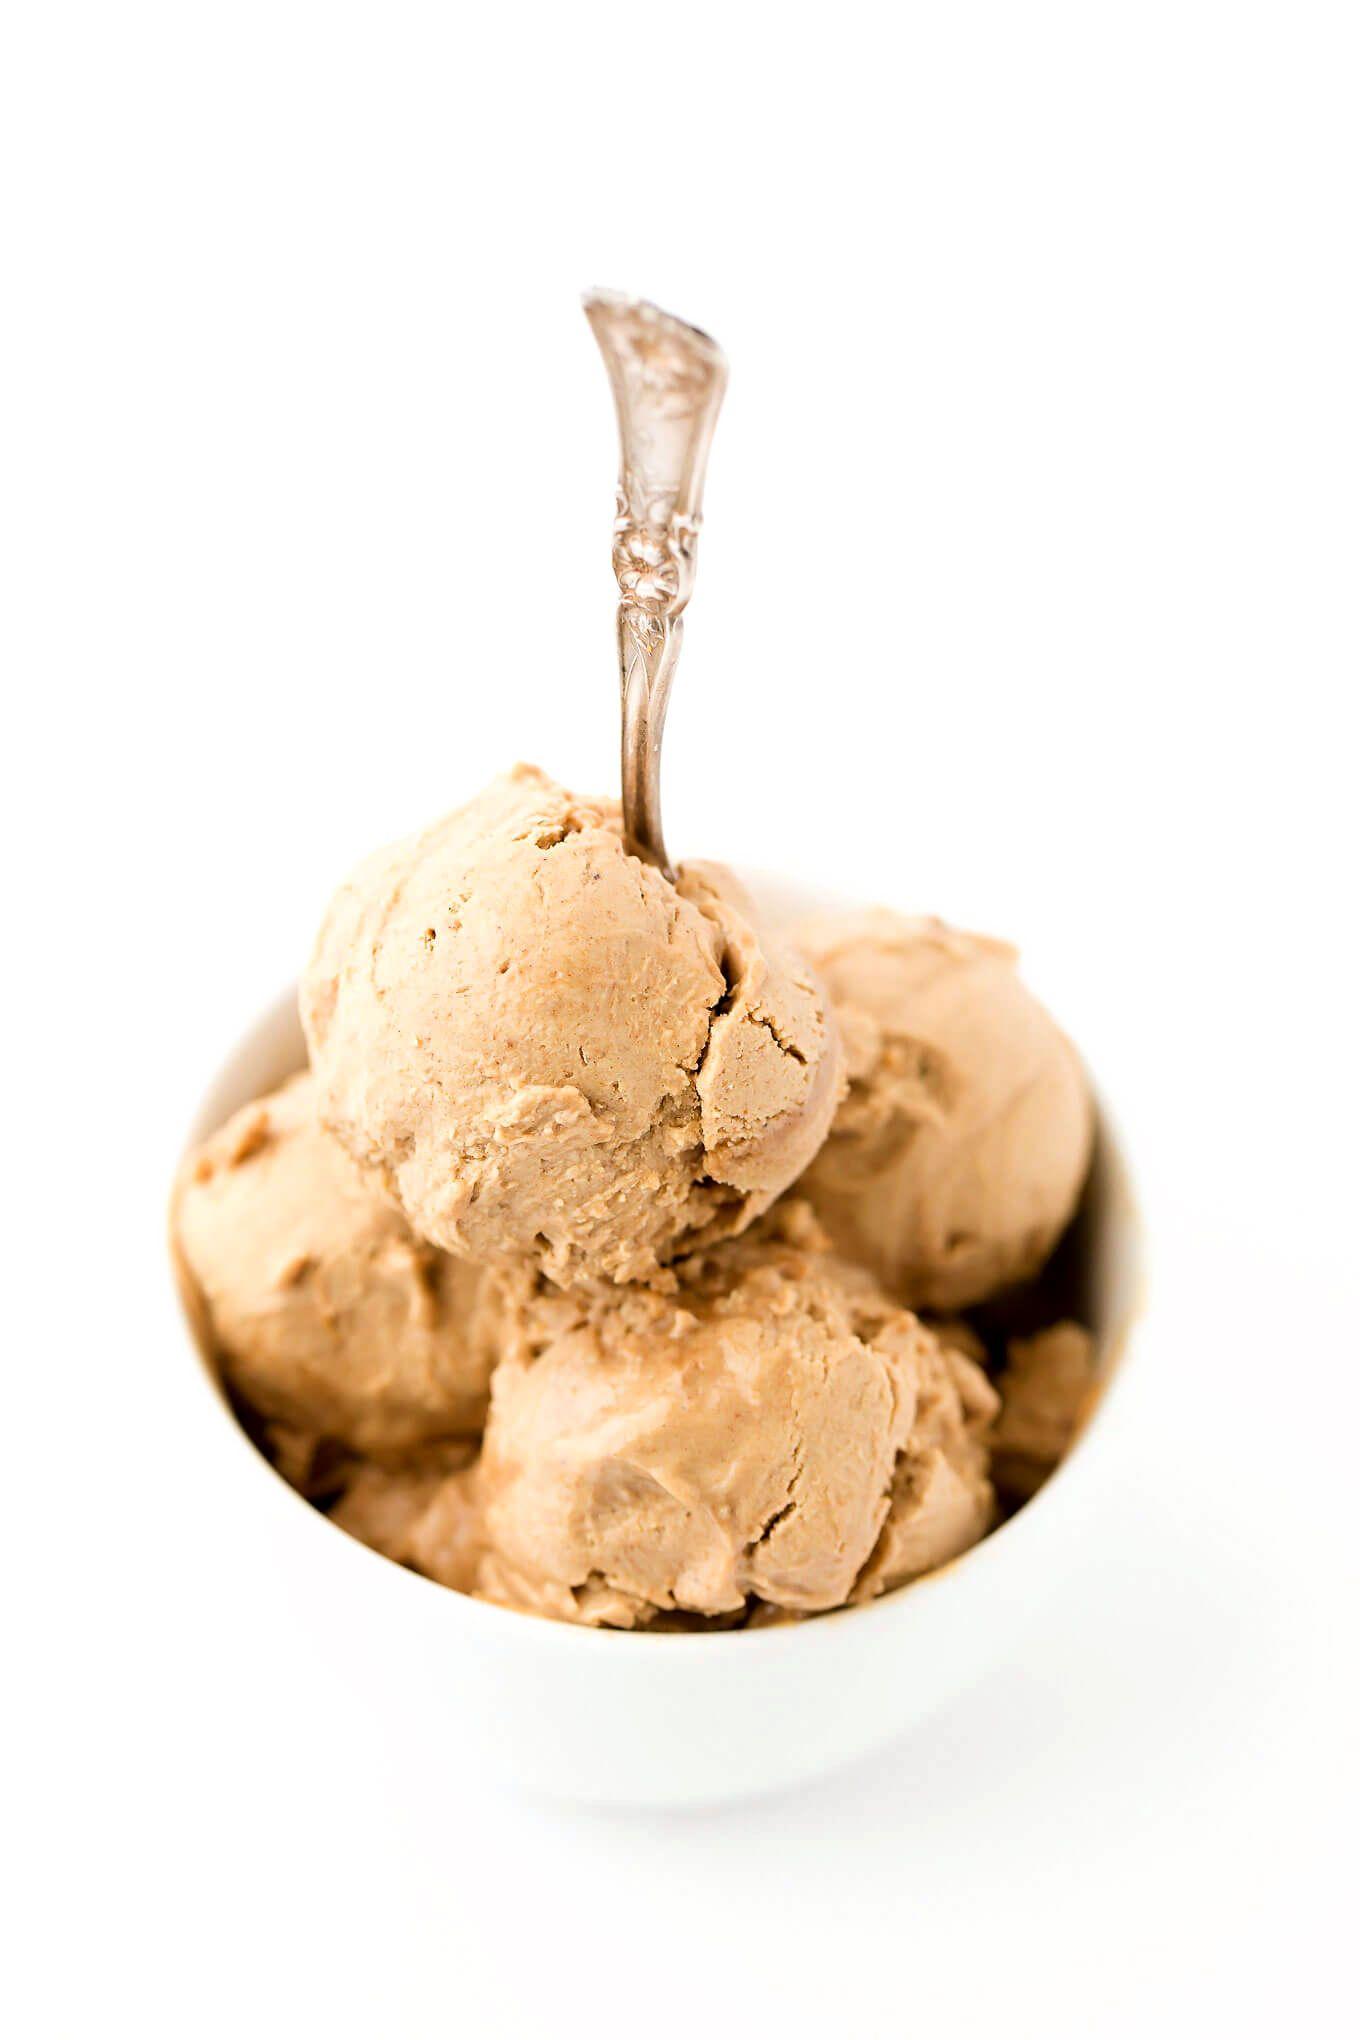 Vegan No Churn Cinnamon Roll Ice Cream Recipe Almond Milk Ice Cream Recipe Healthy Ice Cream Recipes Vegan Ice Cream